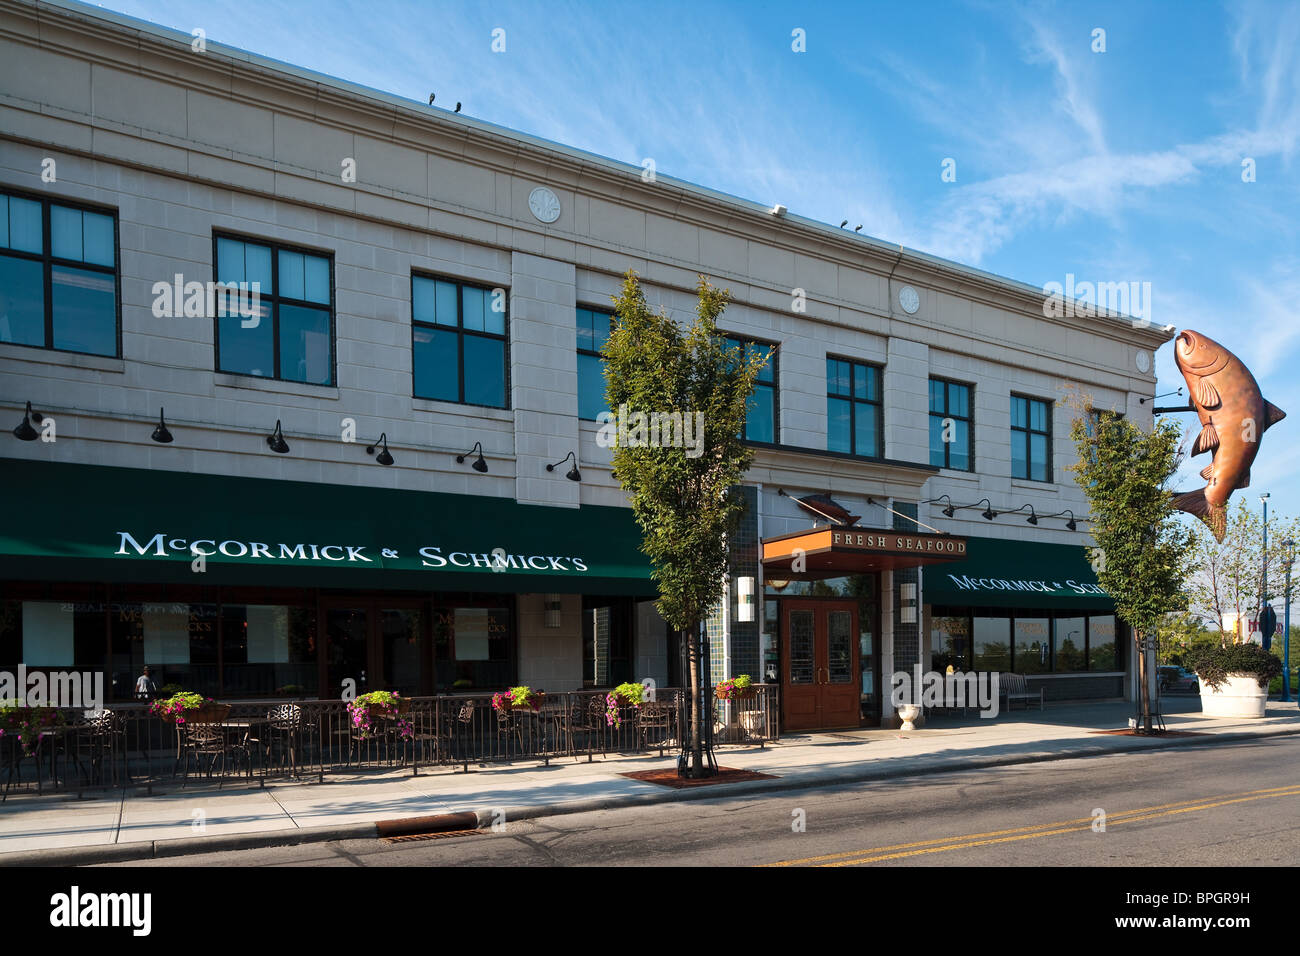 Mccormick schmick 39 s restaurant at easton town center in for Fish restaurants in columbus ohio